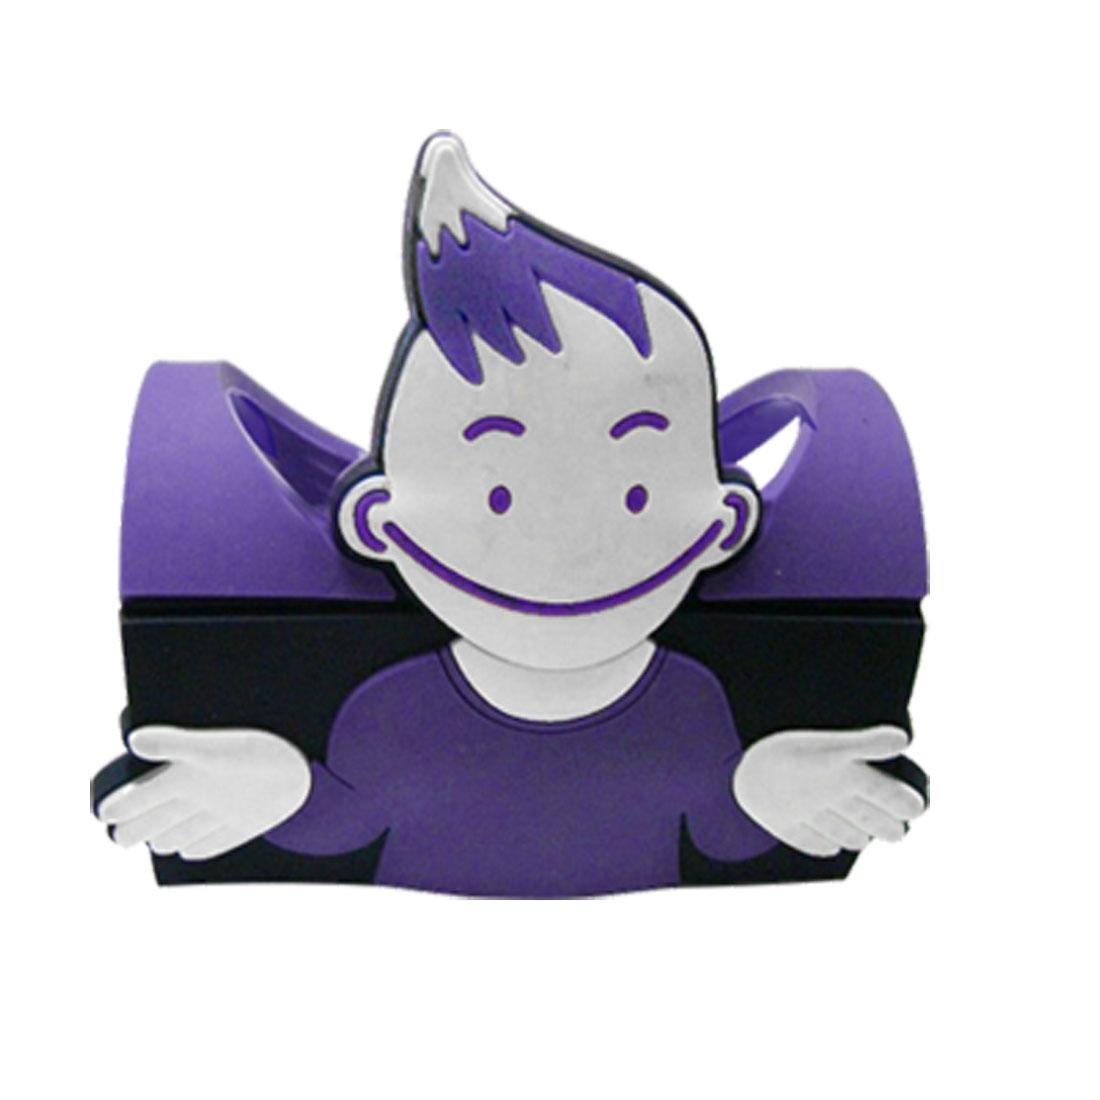 Cartoon Tabletop Rubber Mobile Phone Holder Purple